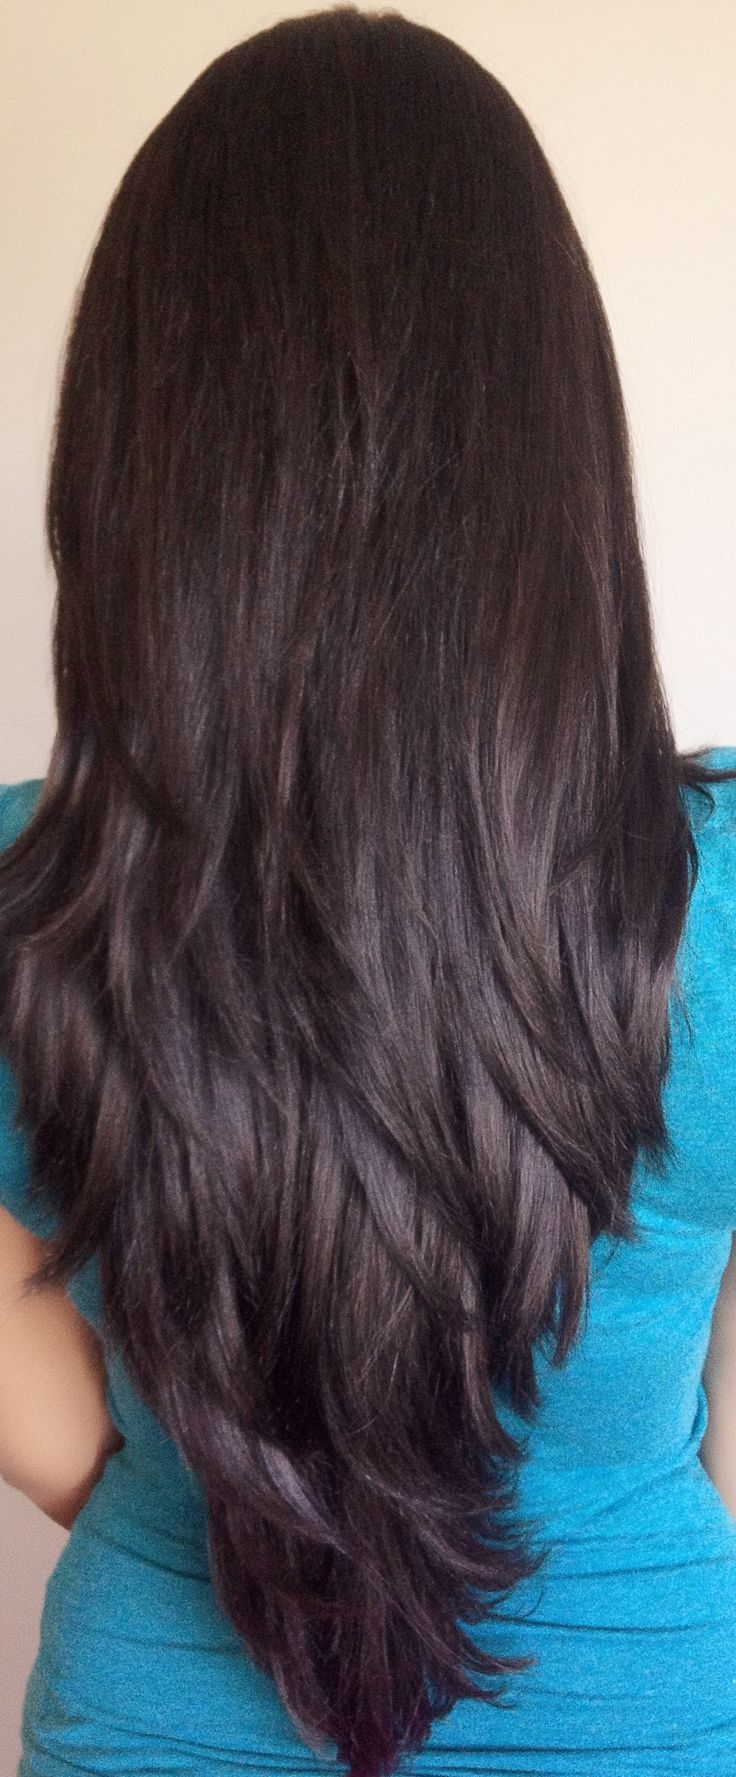 Best Haircuts For Long Hair 01 Jpg 736 1 777 Pixels Long Hair Styles Hair Styler Hair Styles